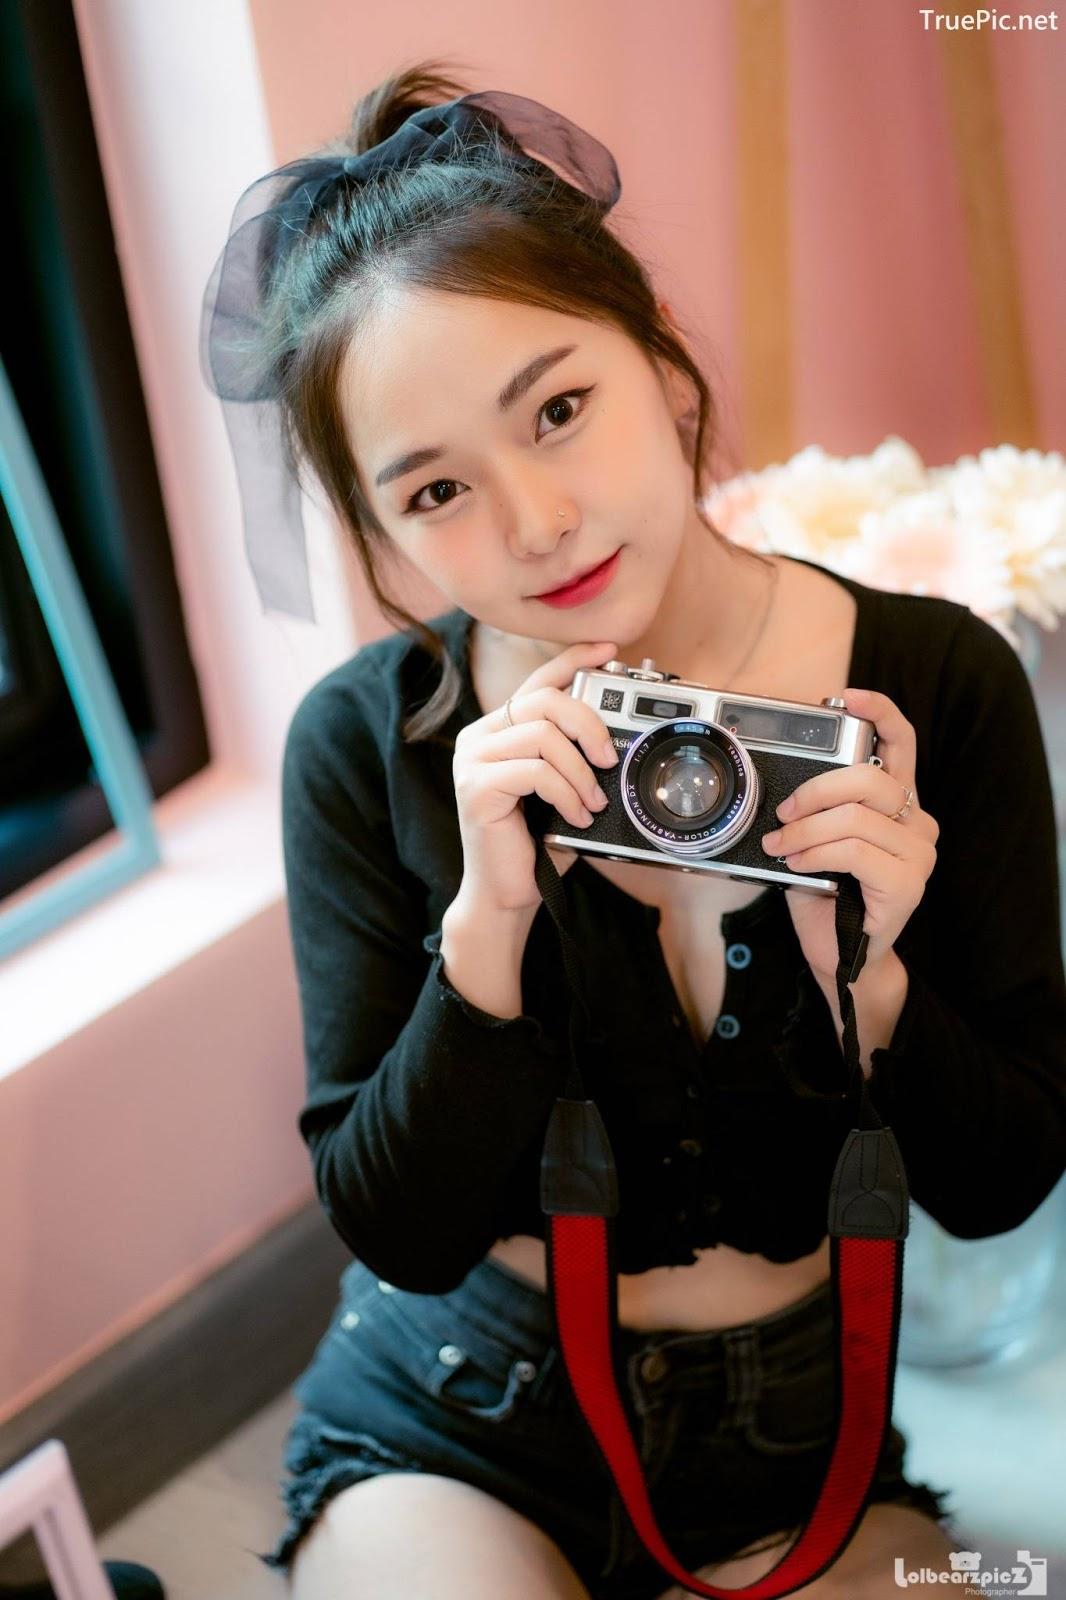 Image Thailand Model - Sunna Dewa - Cute Naughty Girl - TruePic.net - Picture-6